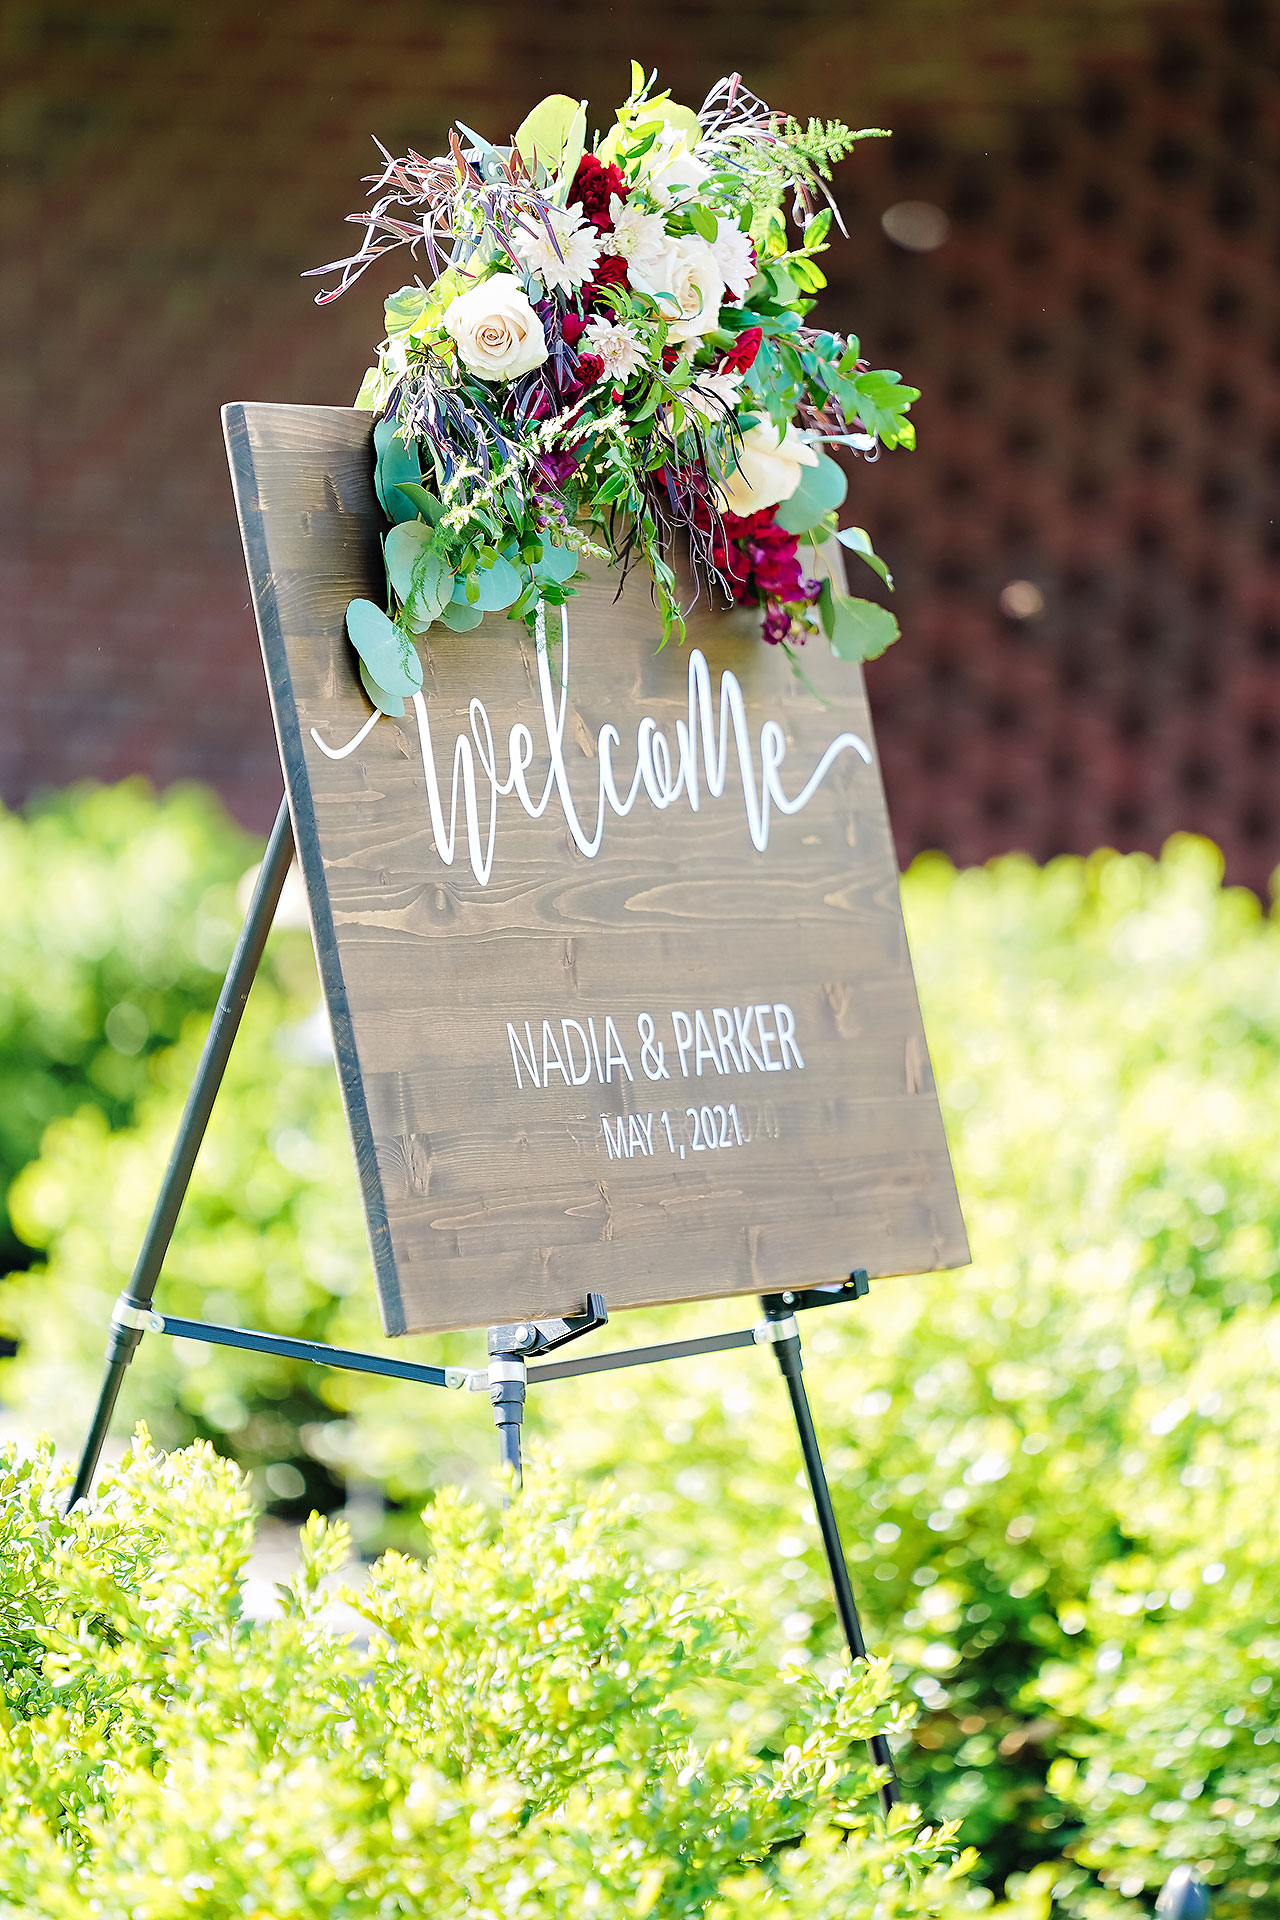 Nadia Parker Black Iris Estate Carmel Indiana Wedding May 2021 166